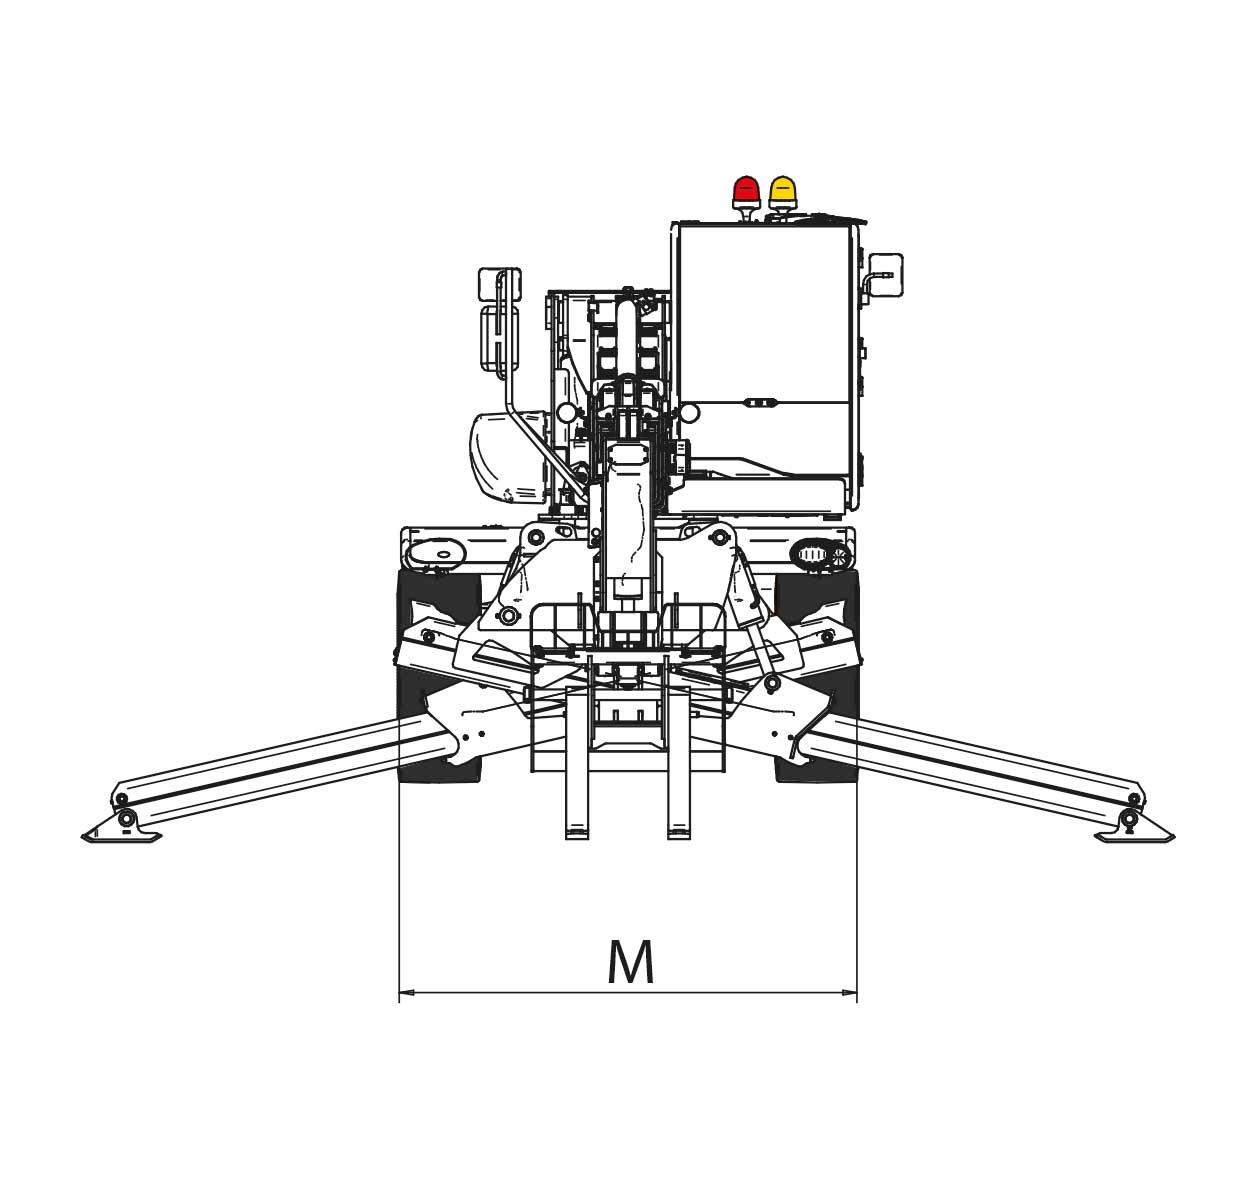 Sollevatore telescopico rotante CT25R_PAG68_5